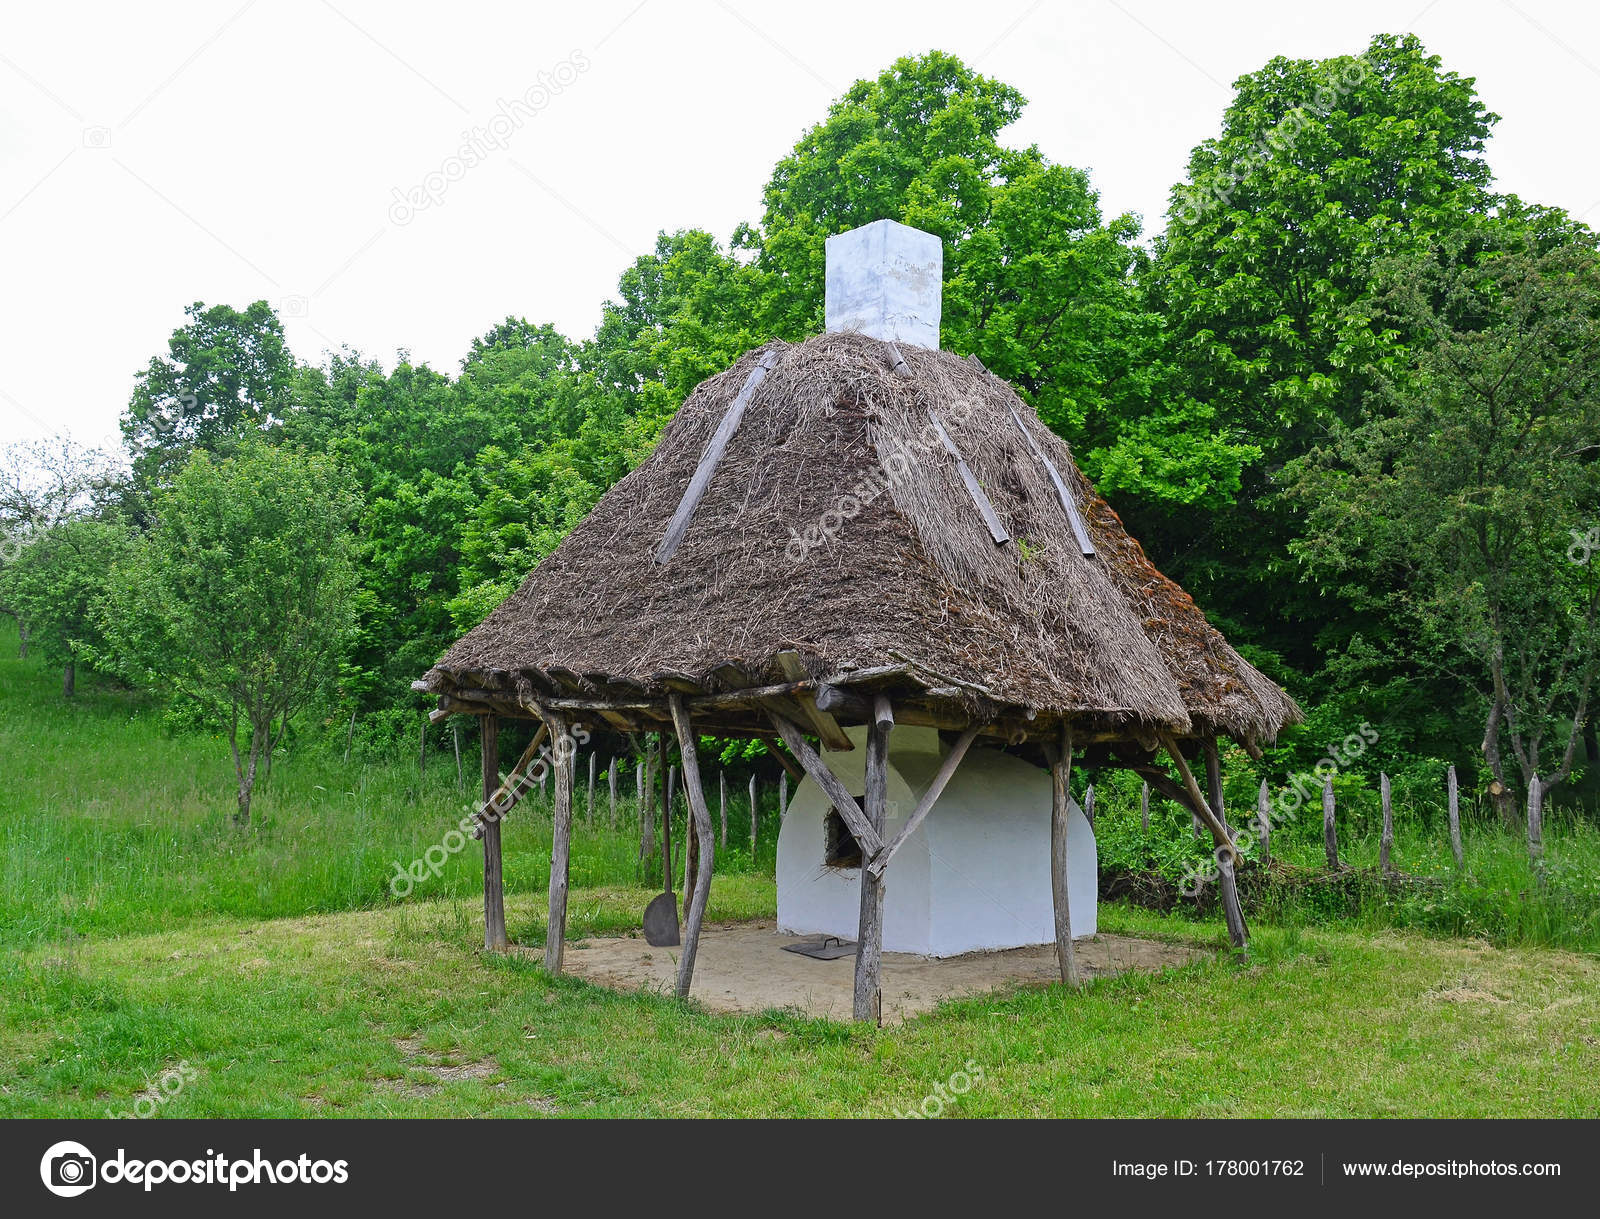 Outdoor Küche Lidl : Pavillon outdoor küche lidl pavillon füße schneider ampelschirm